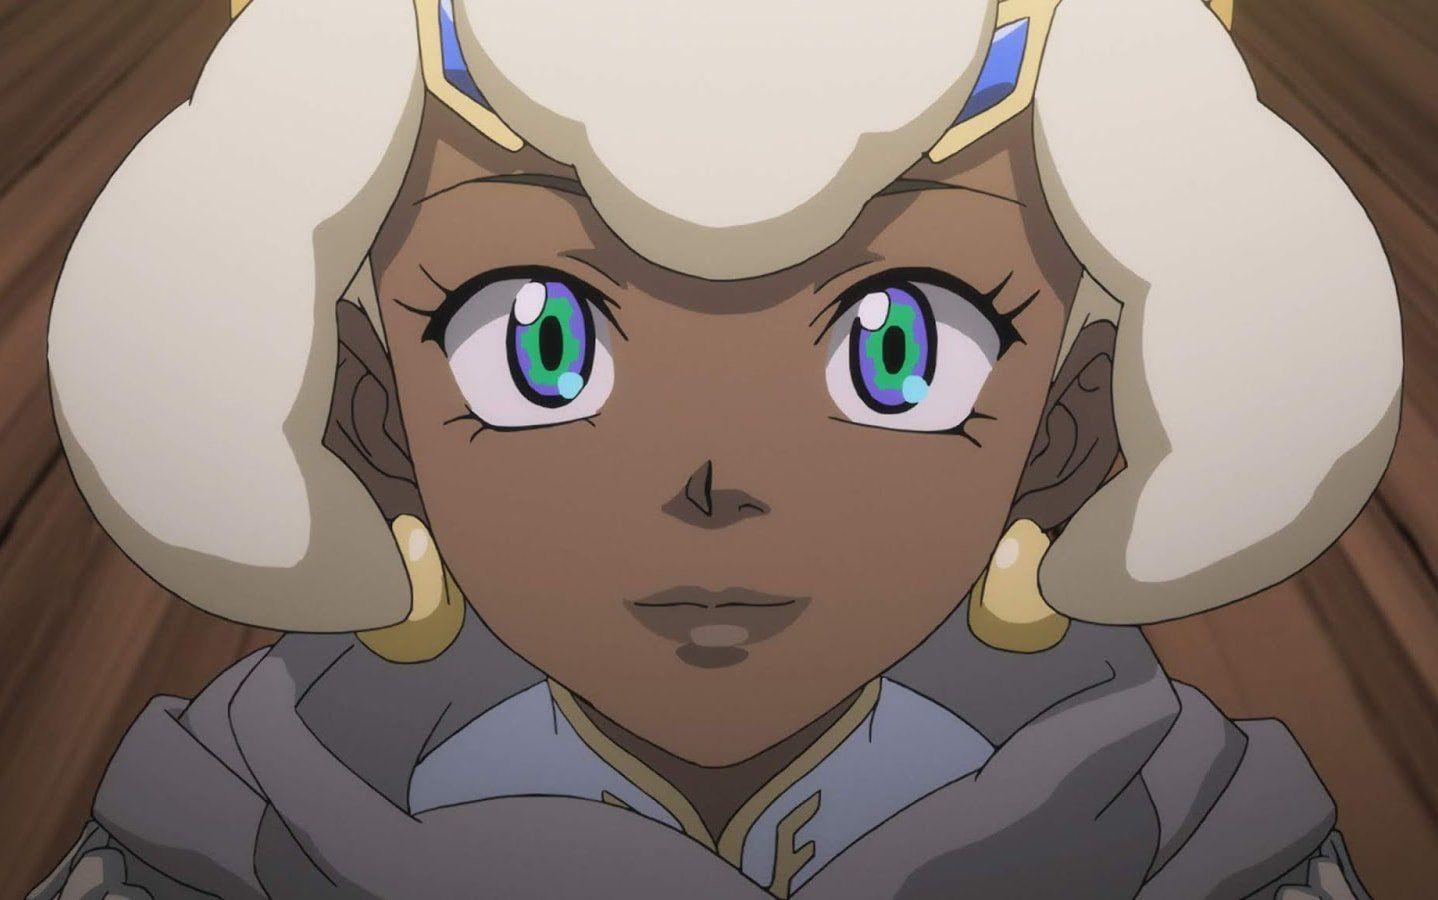 Pin by Indi ( •⌄• ू ) on anime babies Cartoon profile pics